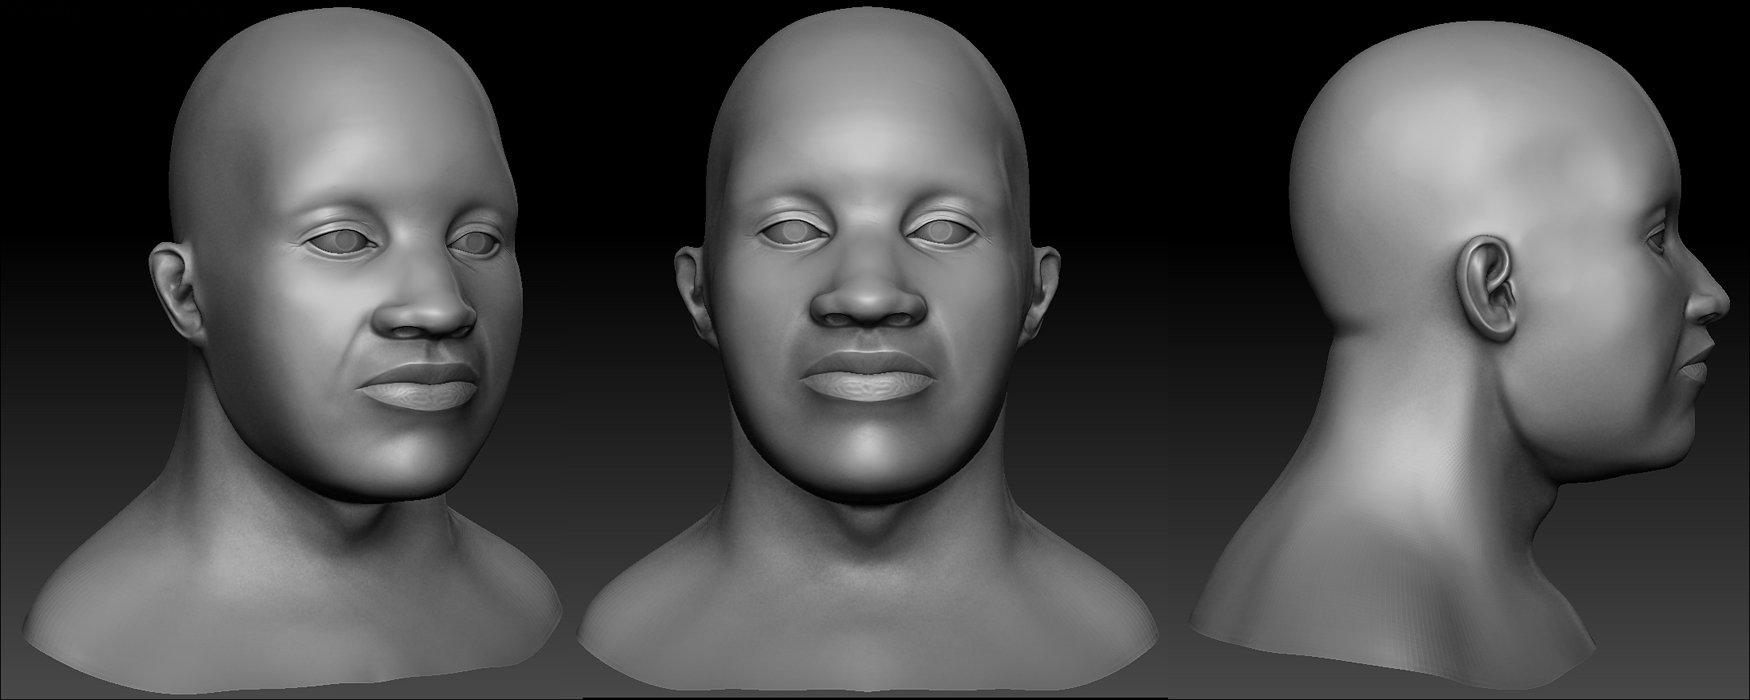 Daniel conroy face hp renders